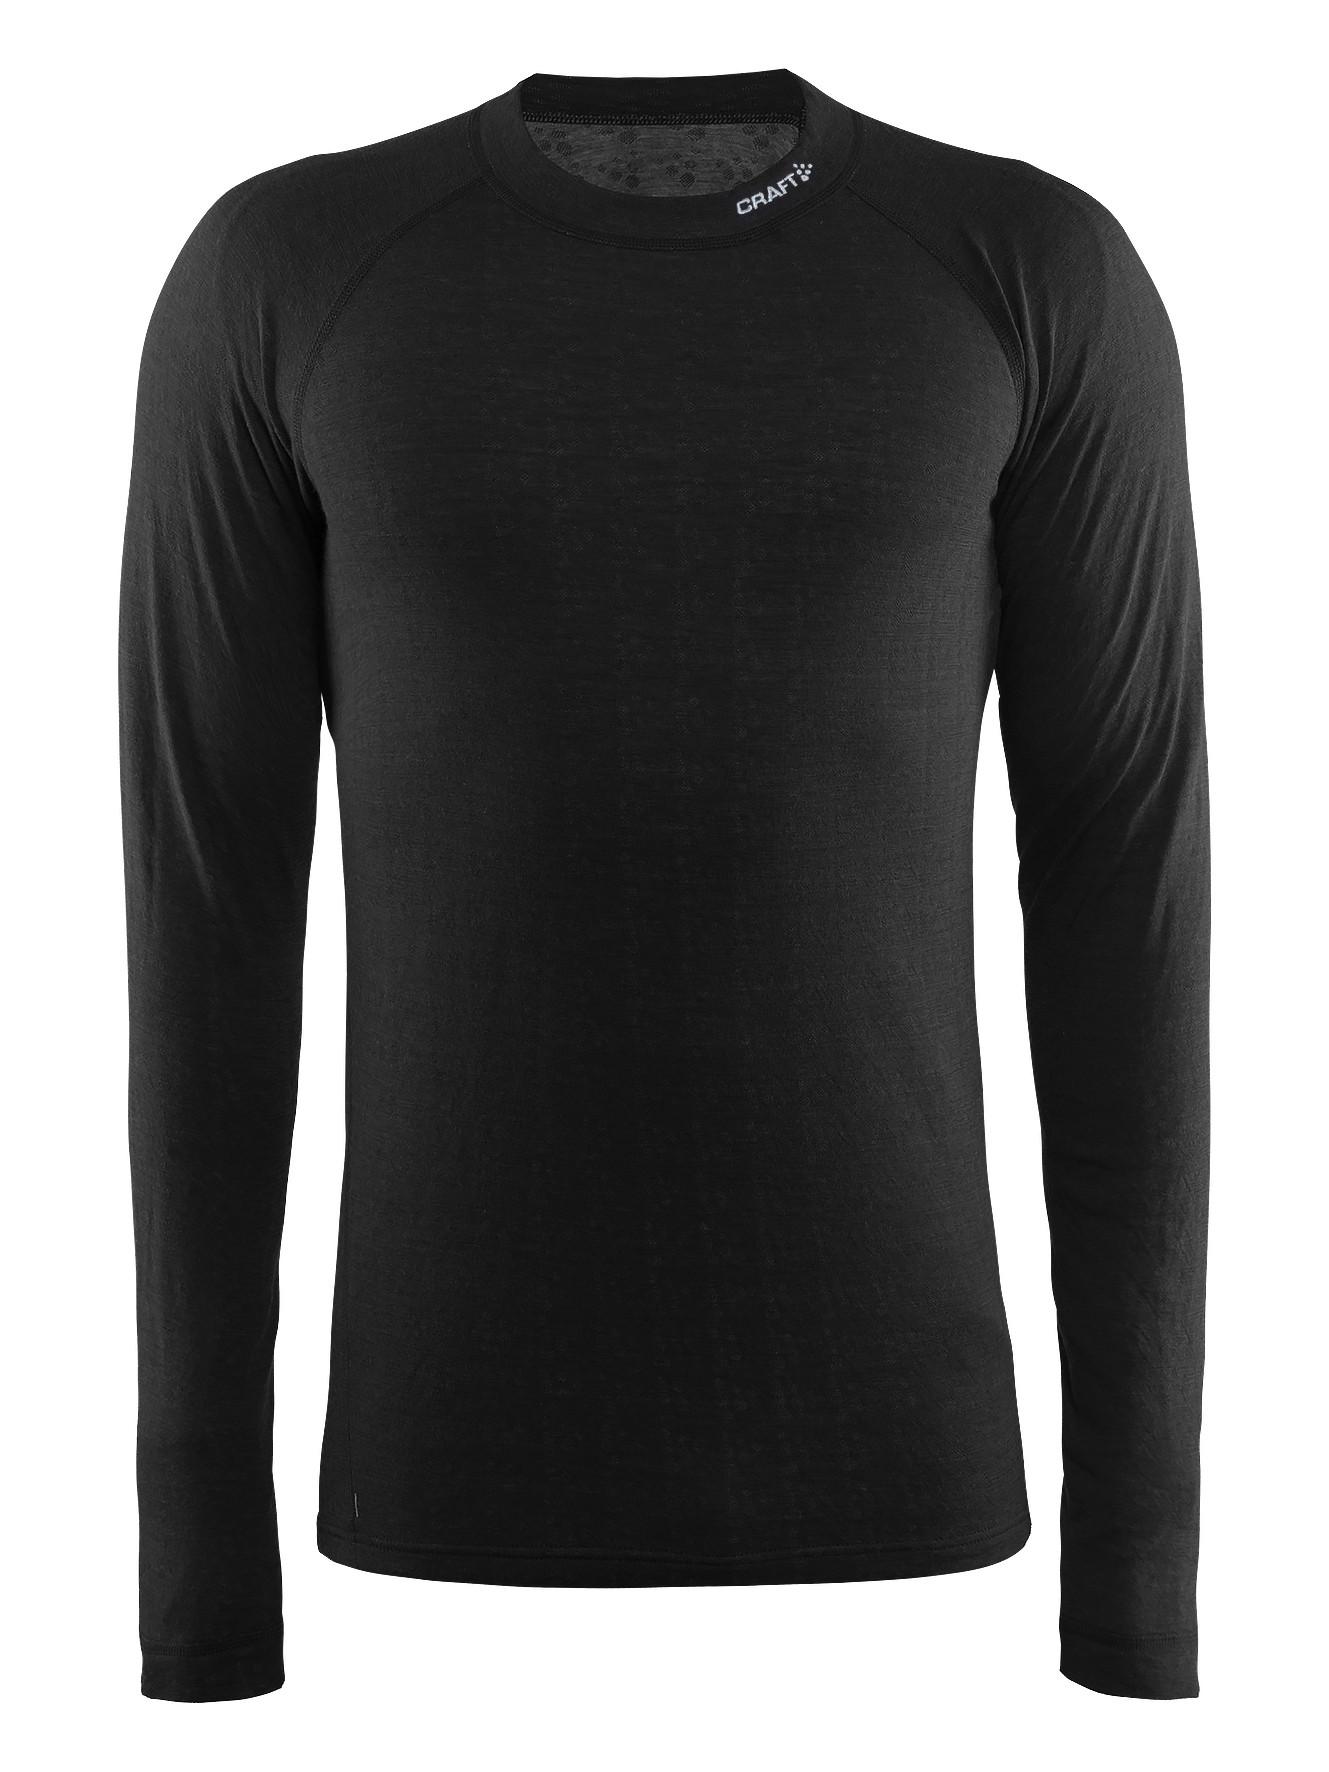 Термофутболка Craft Nordic Wool CN M Black/Dark Grey Melange M